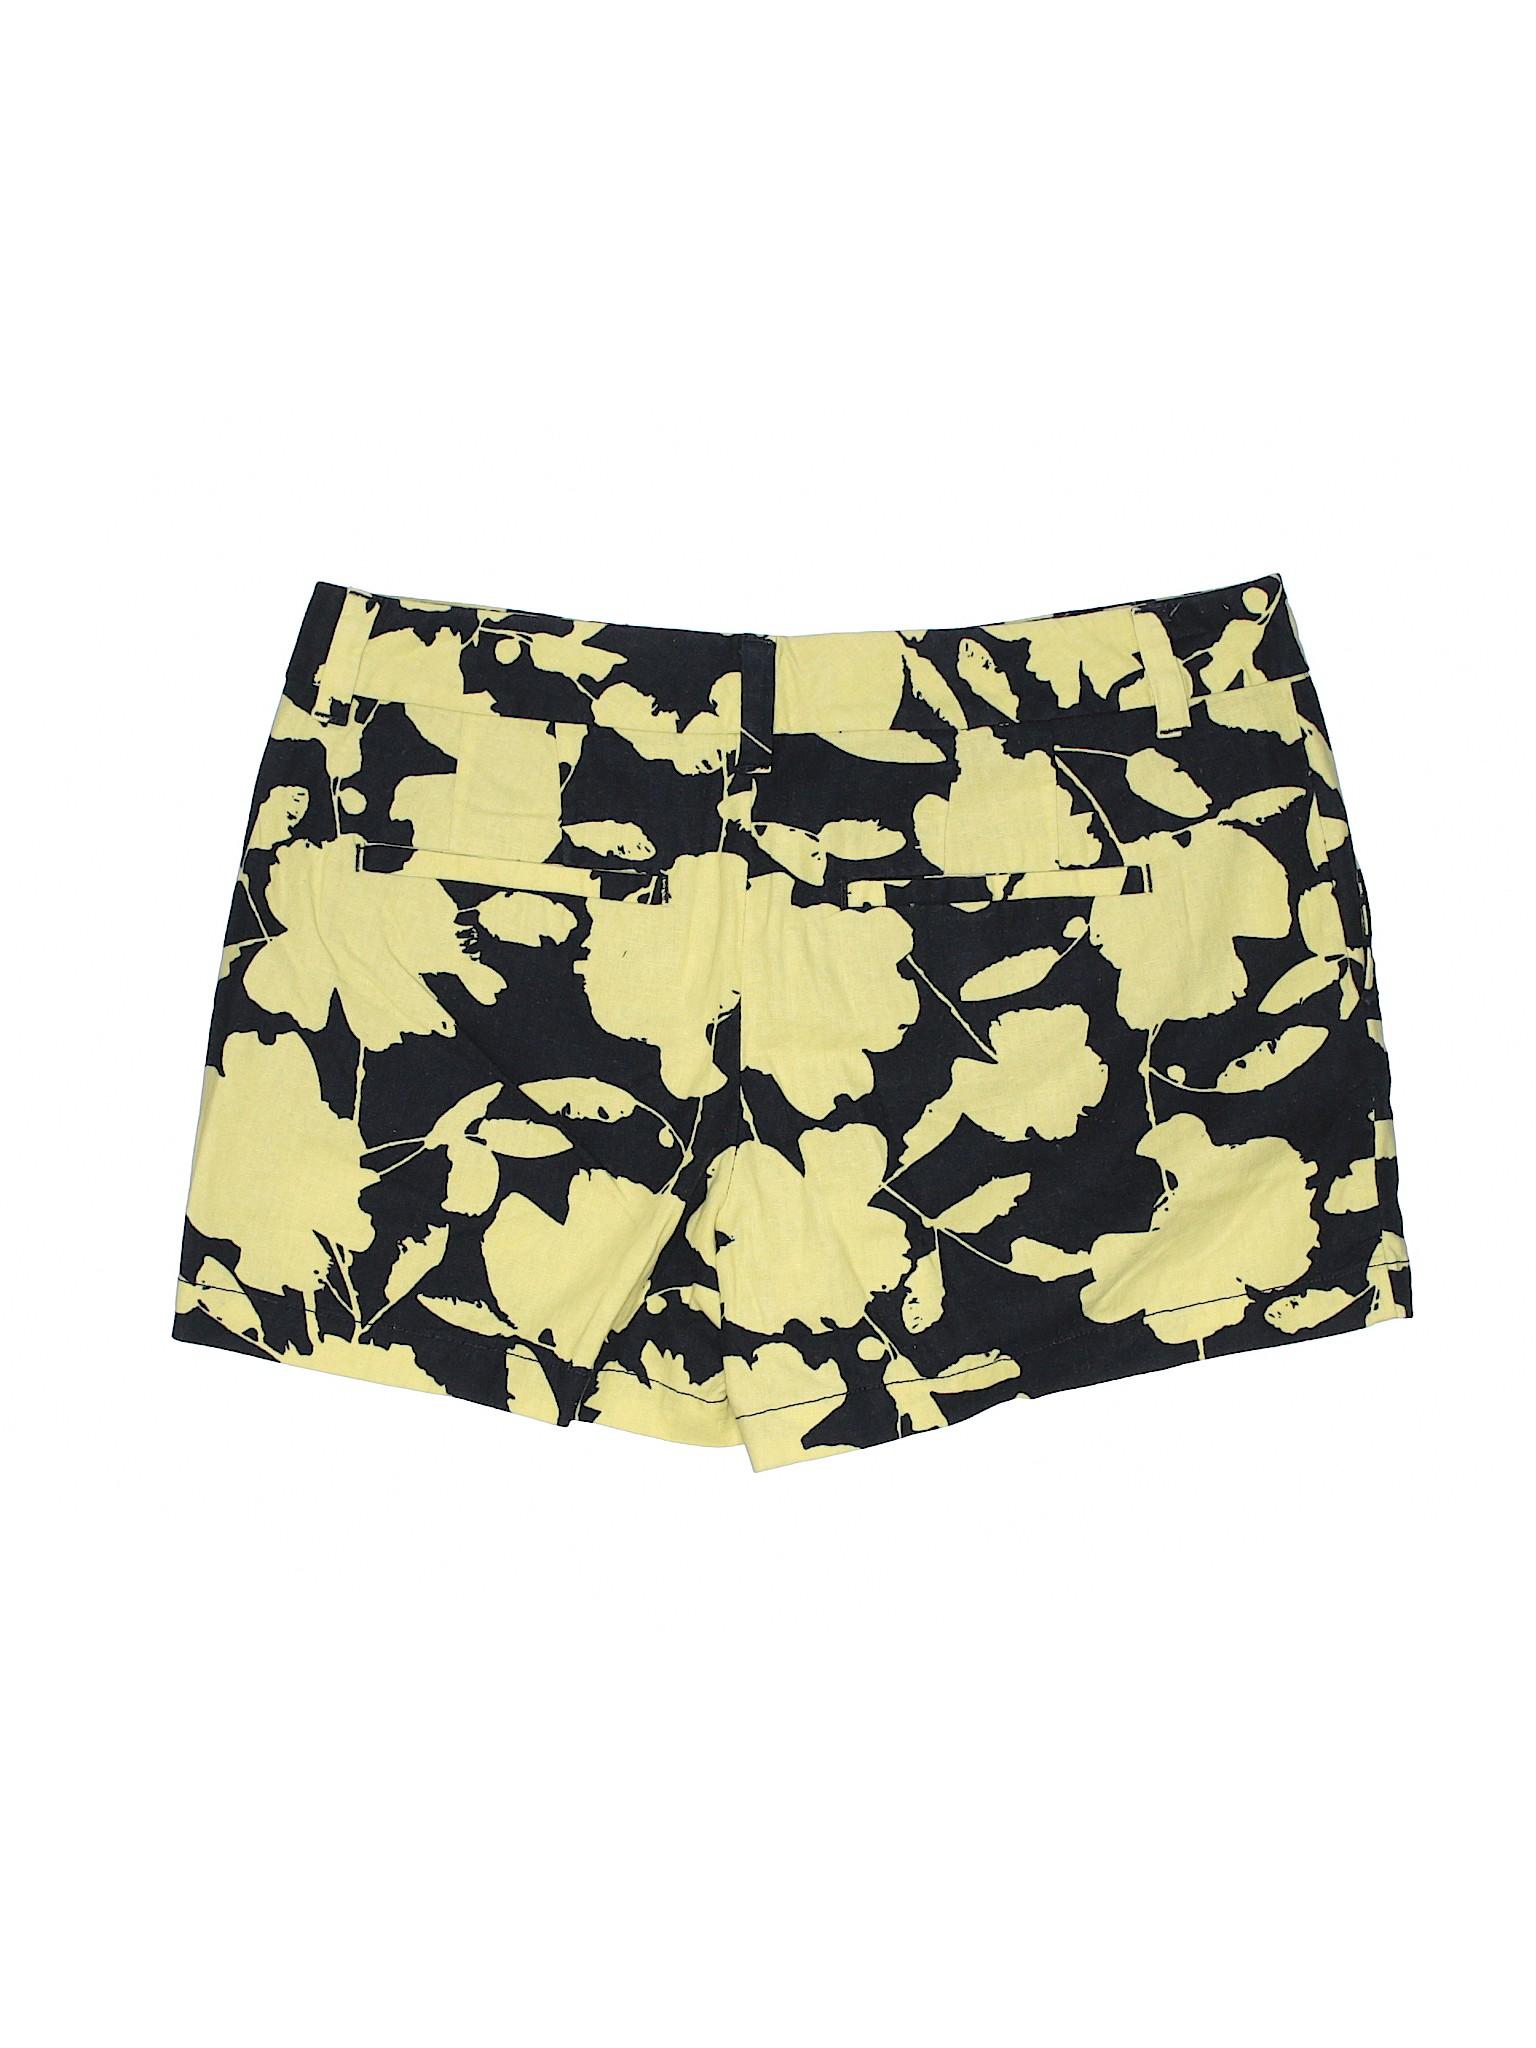 Shorts LOFT Ann Taylor Leisure winter qvIOgg